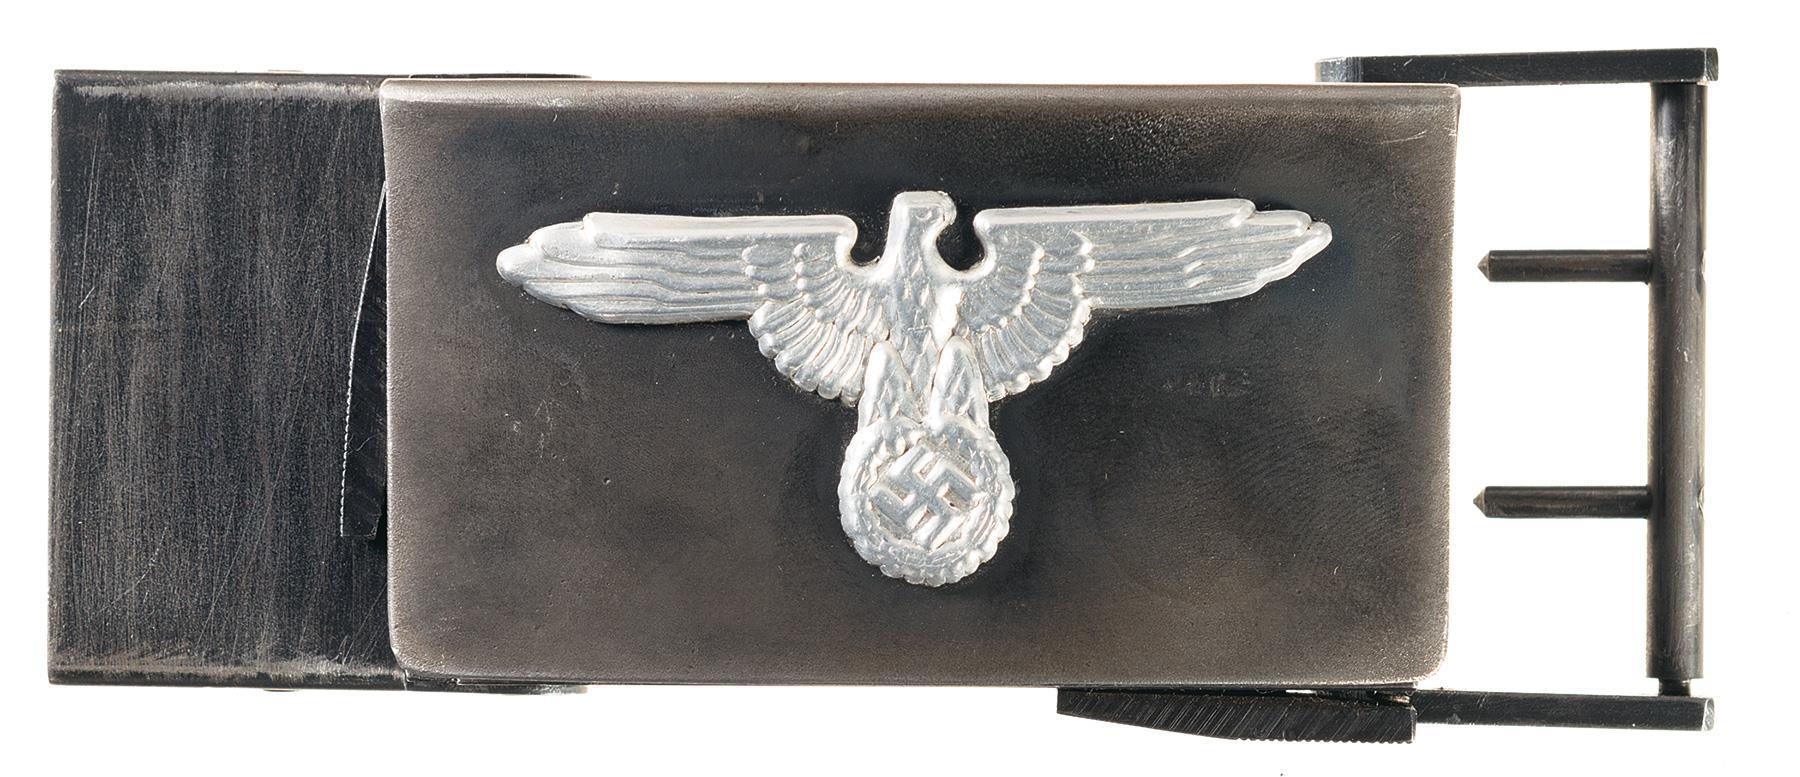 The Koppelschloßpistole (Belt Castle Gun) looks like any old 'Nassi belt buckle on the outside (Photos: RIA)